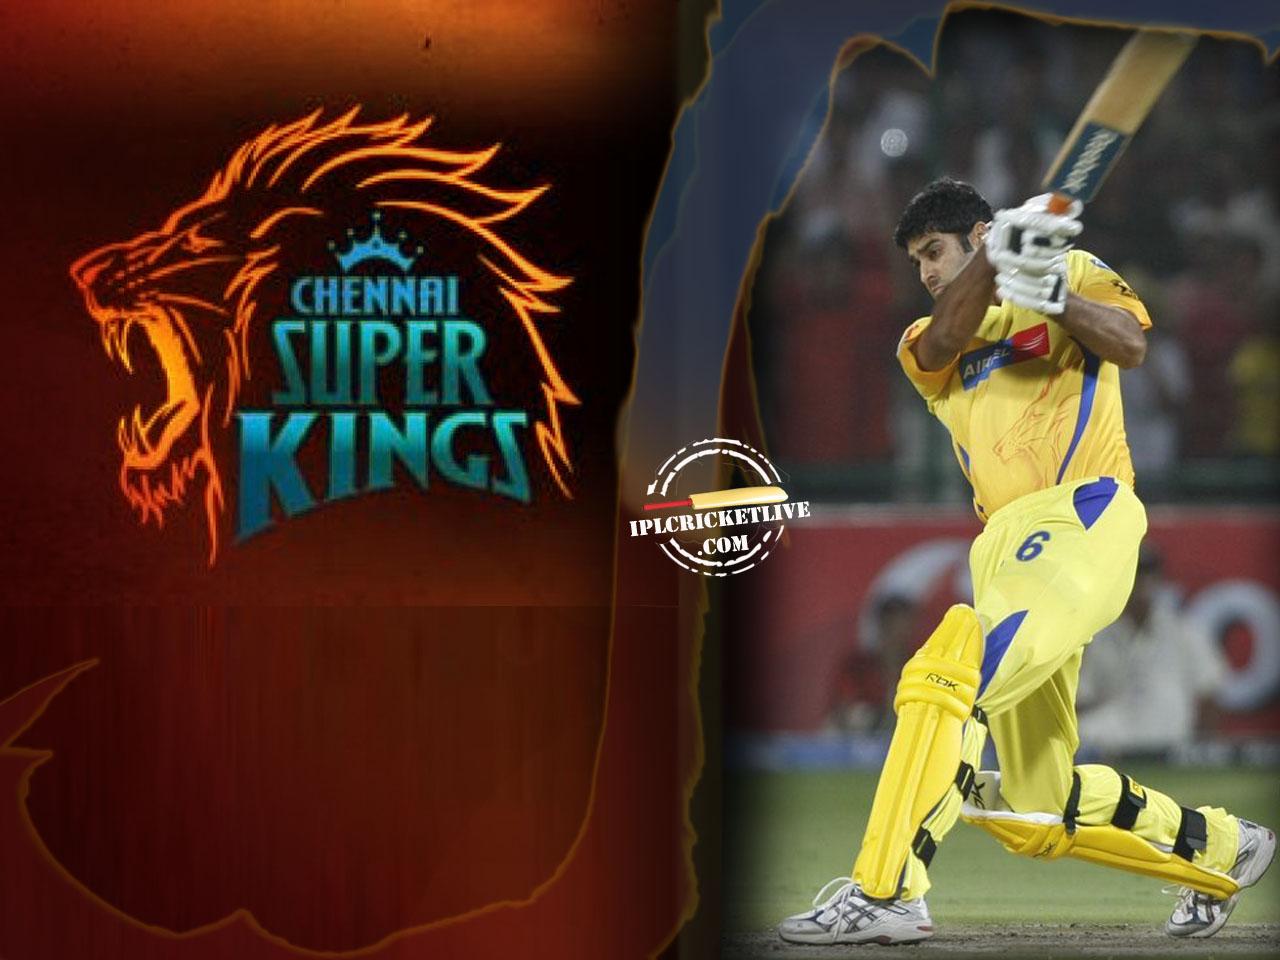 IPL Chennai SuperKings Wallpaper